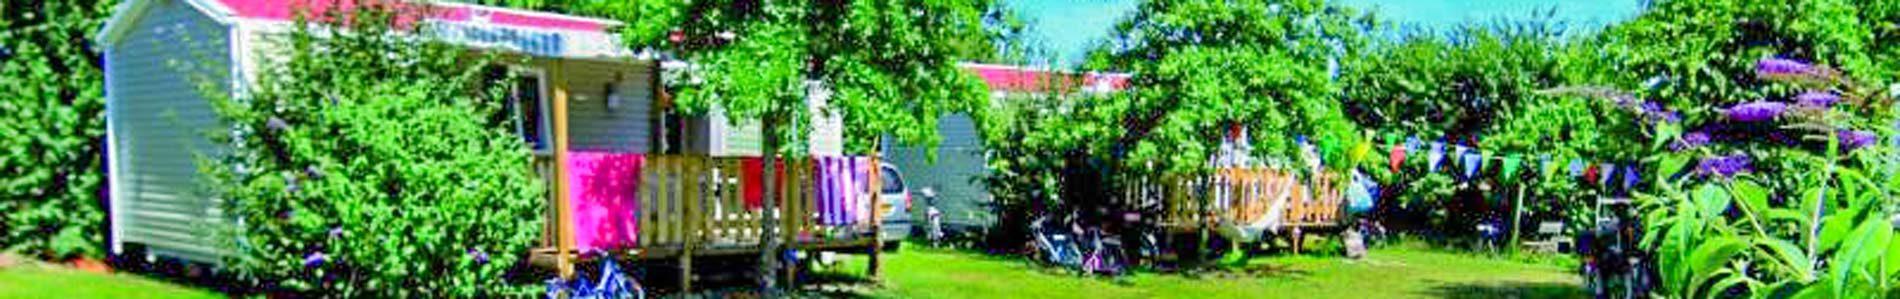 location cottage prairie camping vendée